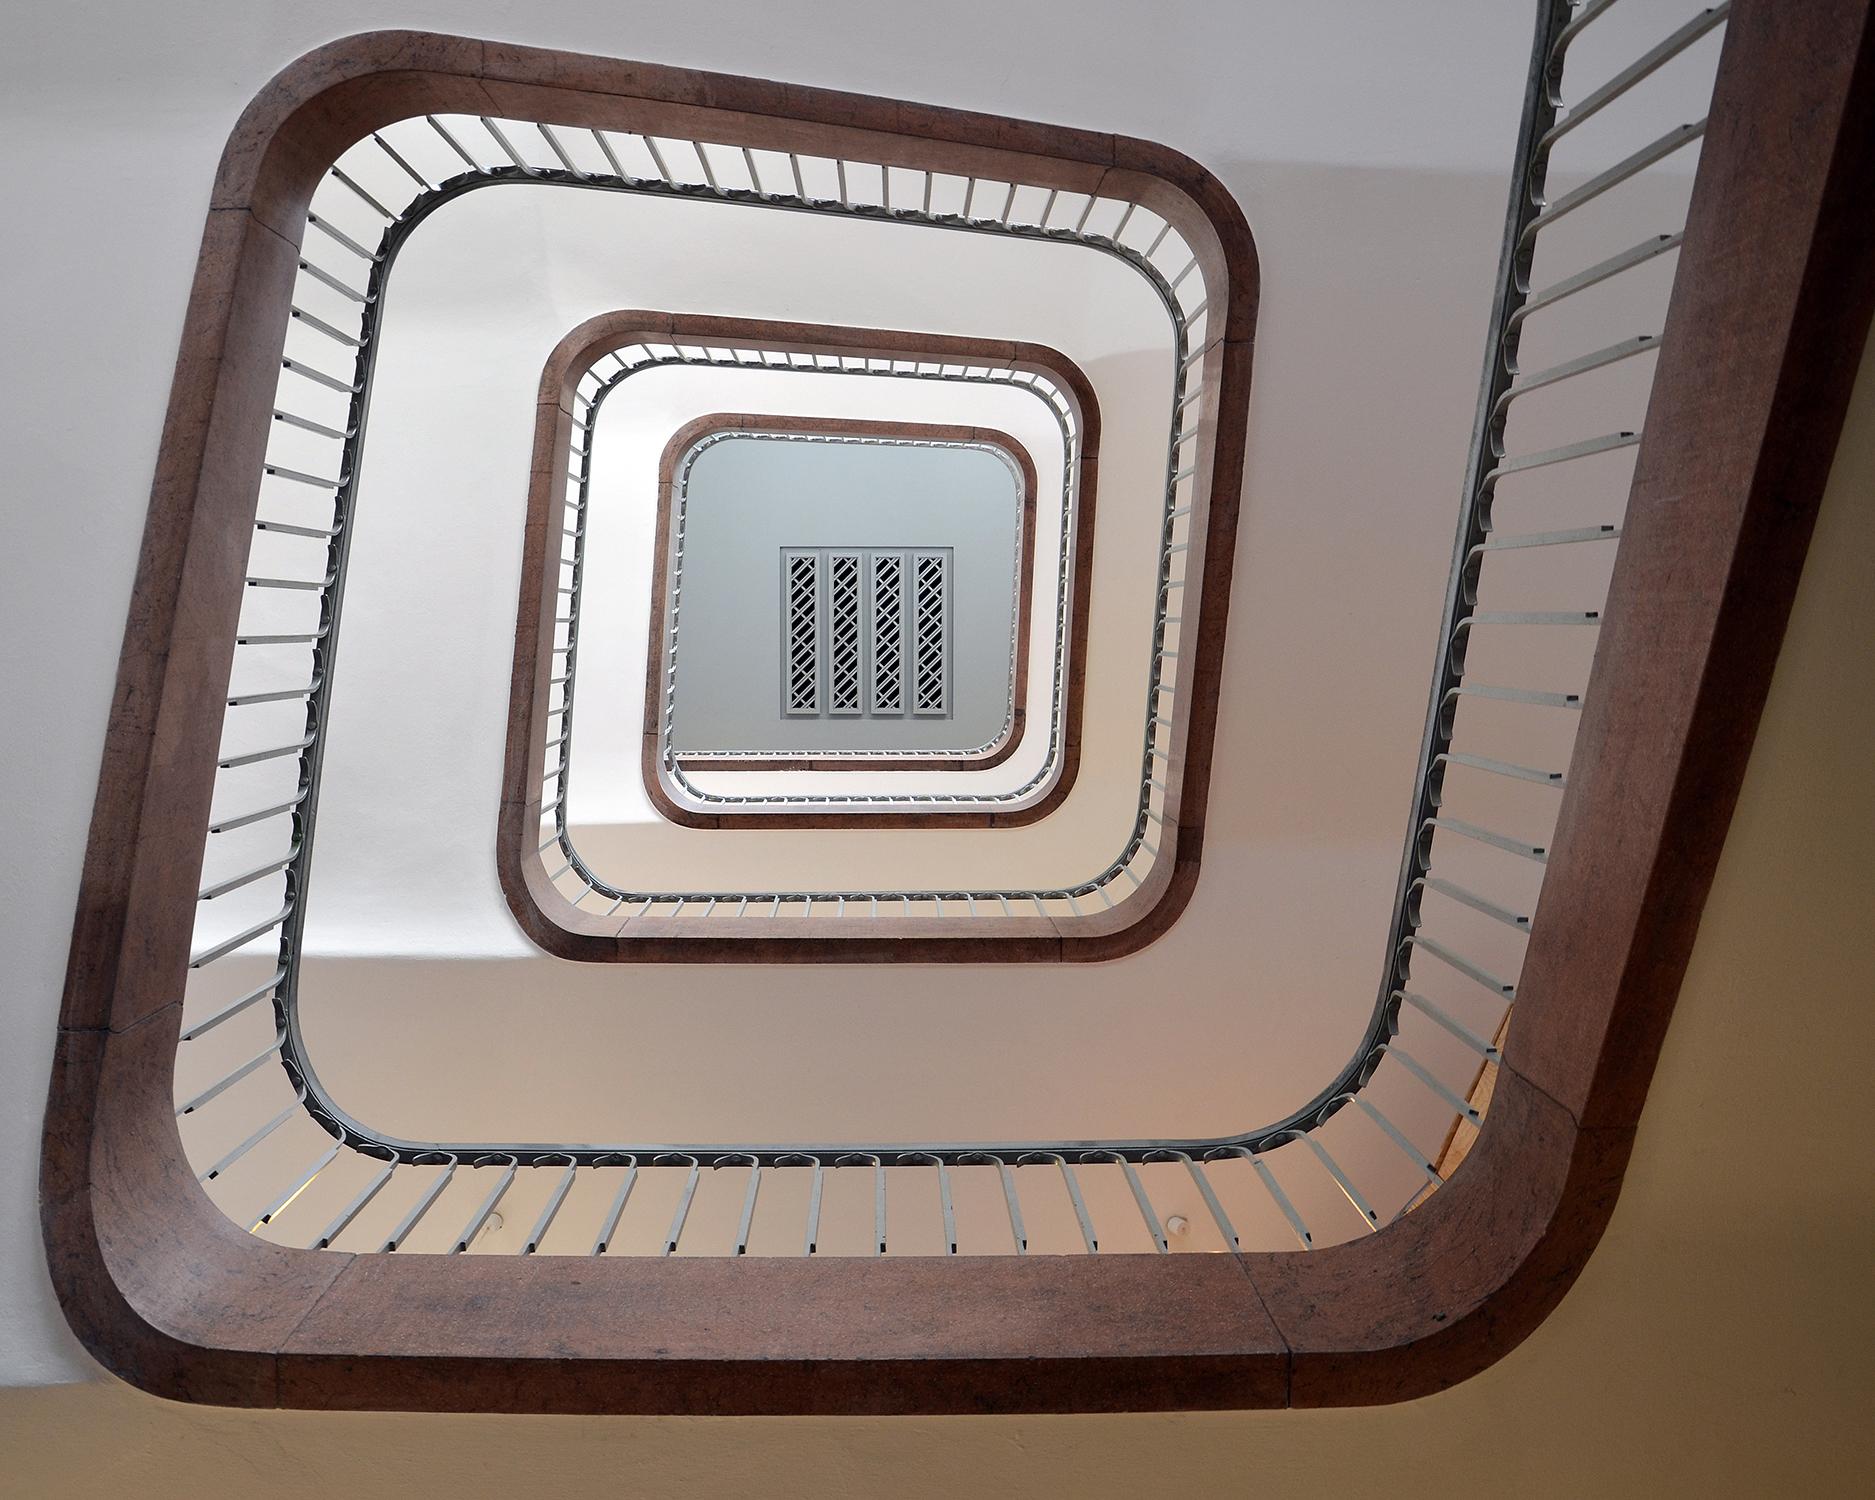 spirale della storia - germania - bendlerblock stauffenberg - 2012.jpg